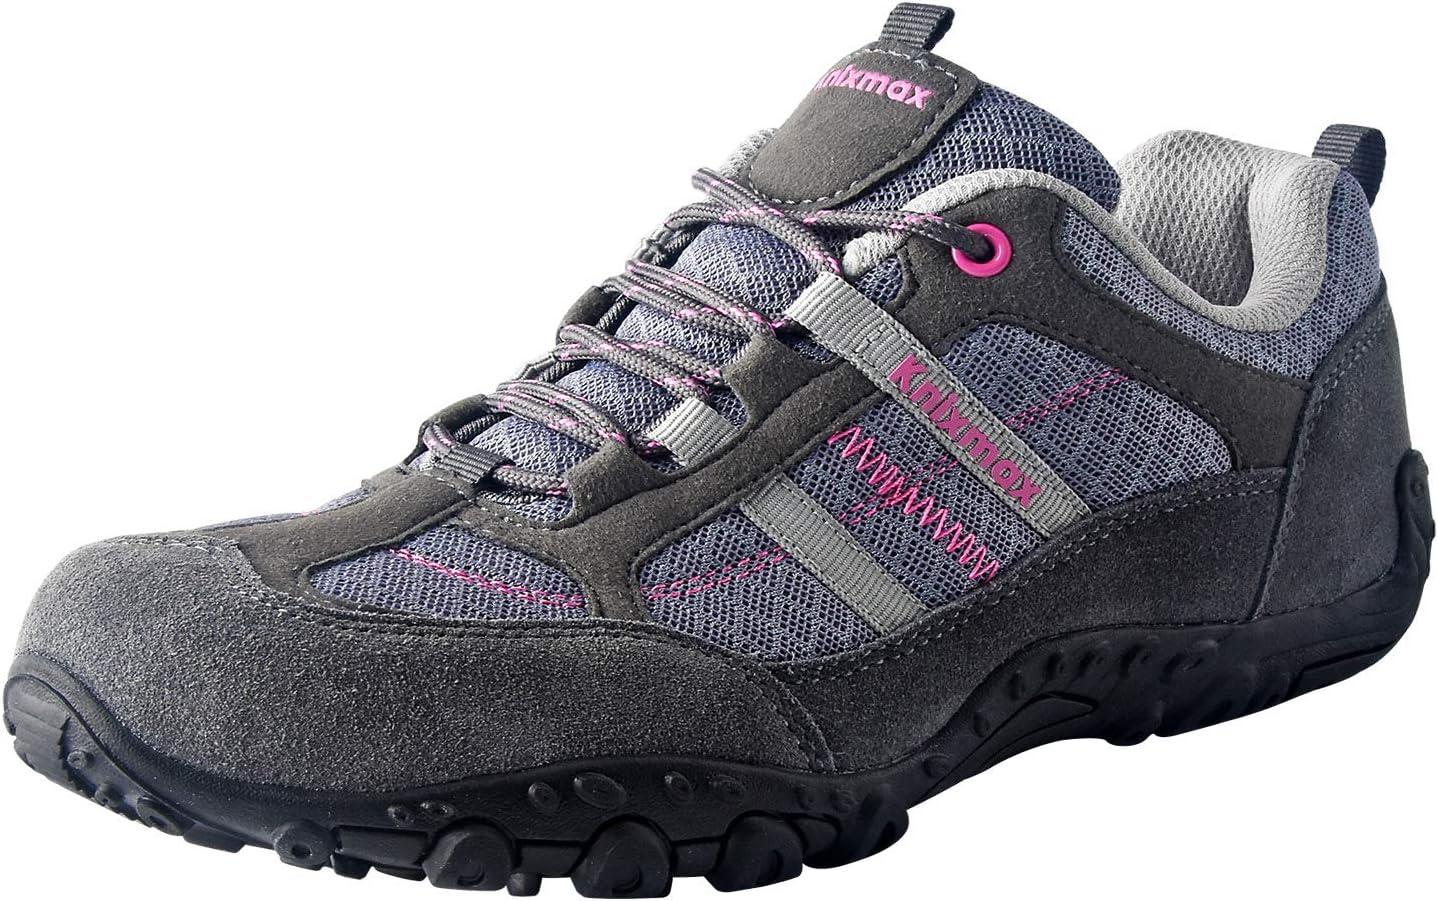 Knixmax Women's Hiking Shoes Lightweight Non-Slip Climbing Trekking Sneakers for Woman Camping Backpacking Shoe: Sports & Outdoors